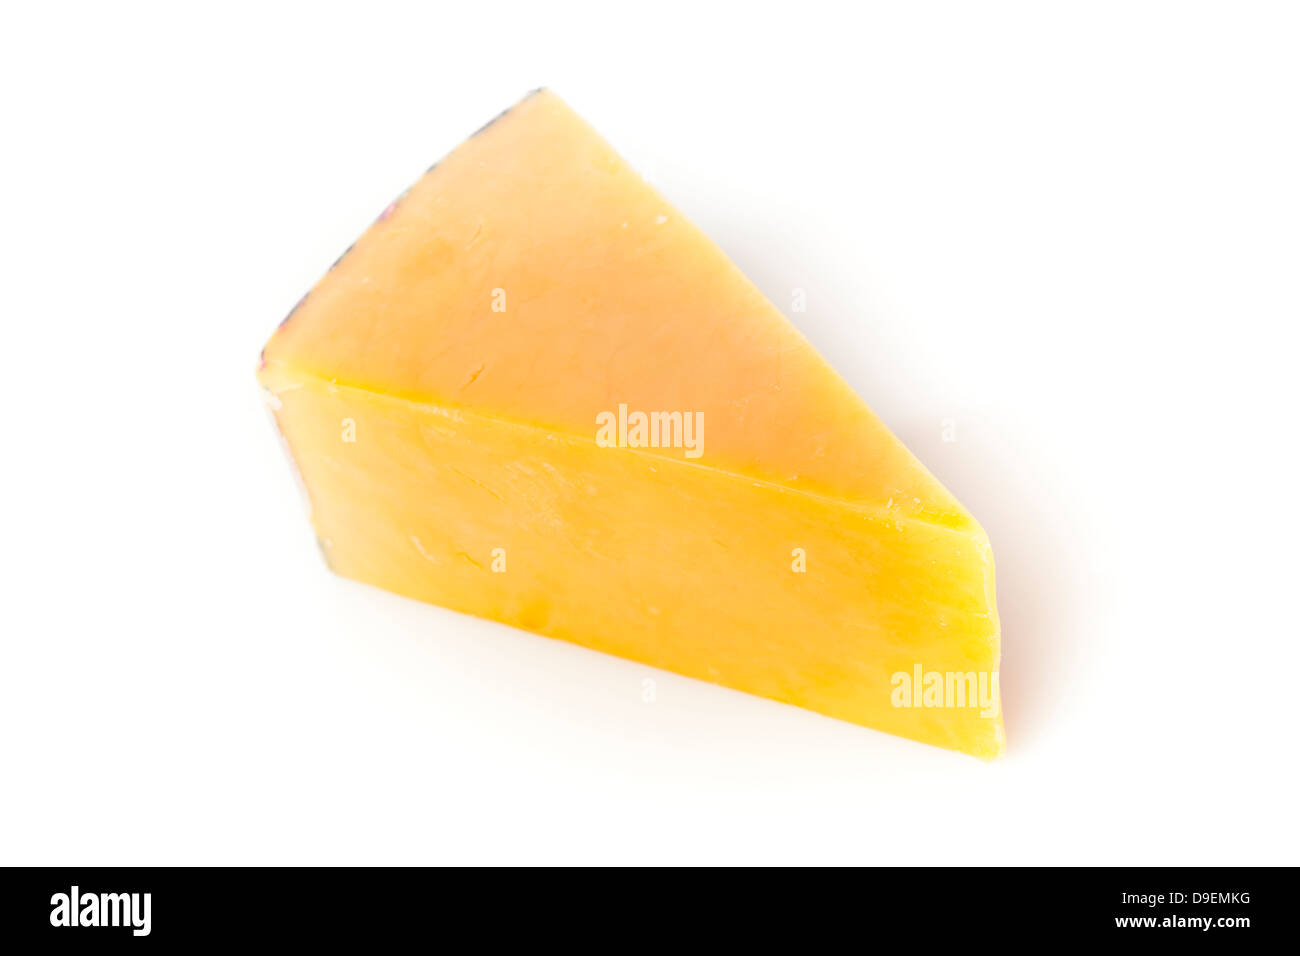 Amarillo tradicional queso Cheddar sobre un fondo Imagen De Stock